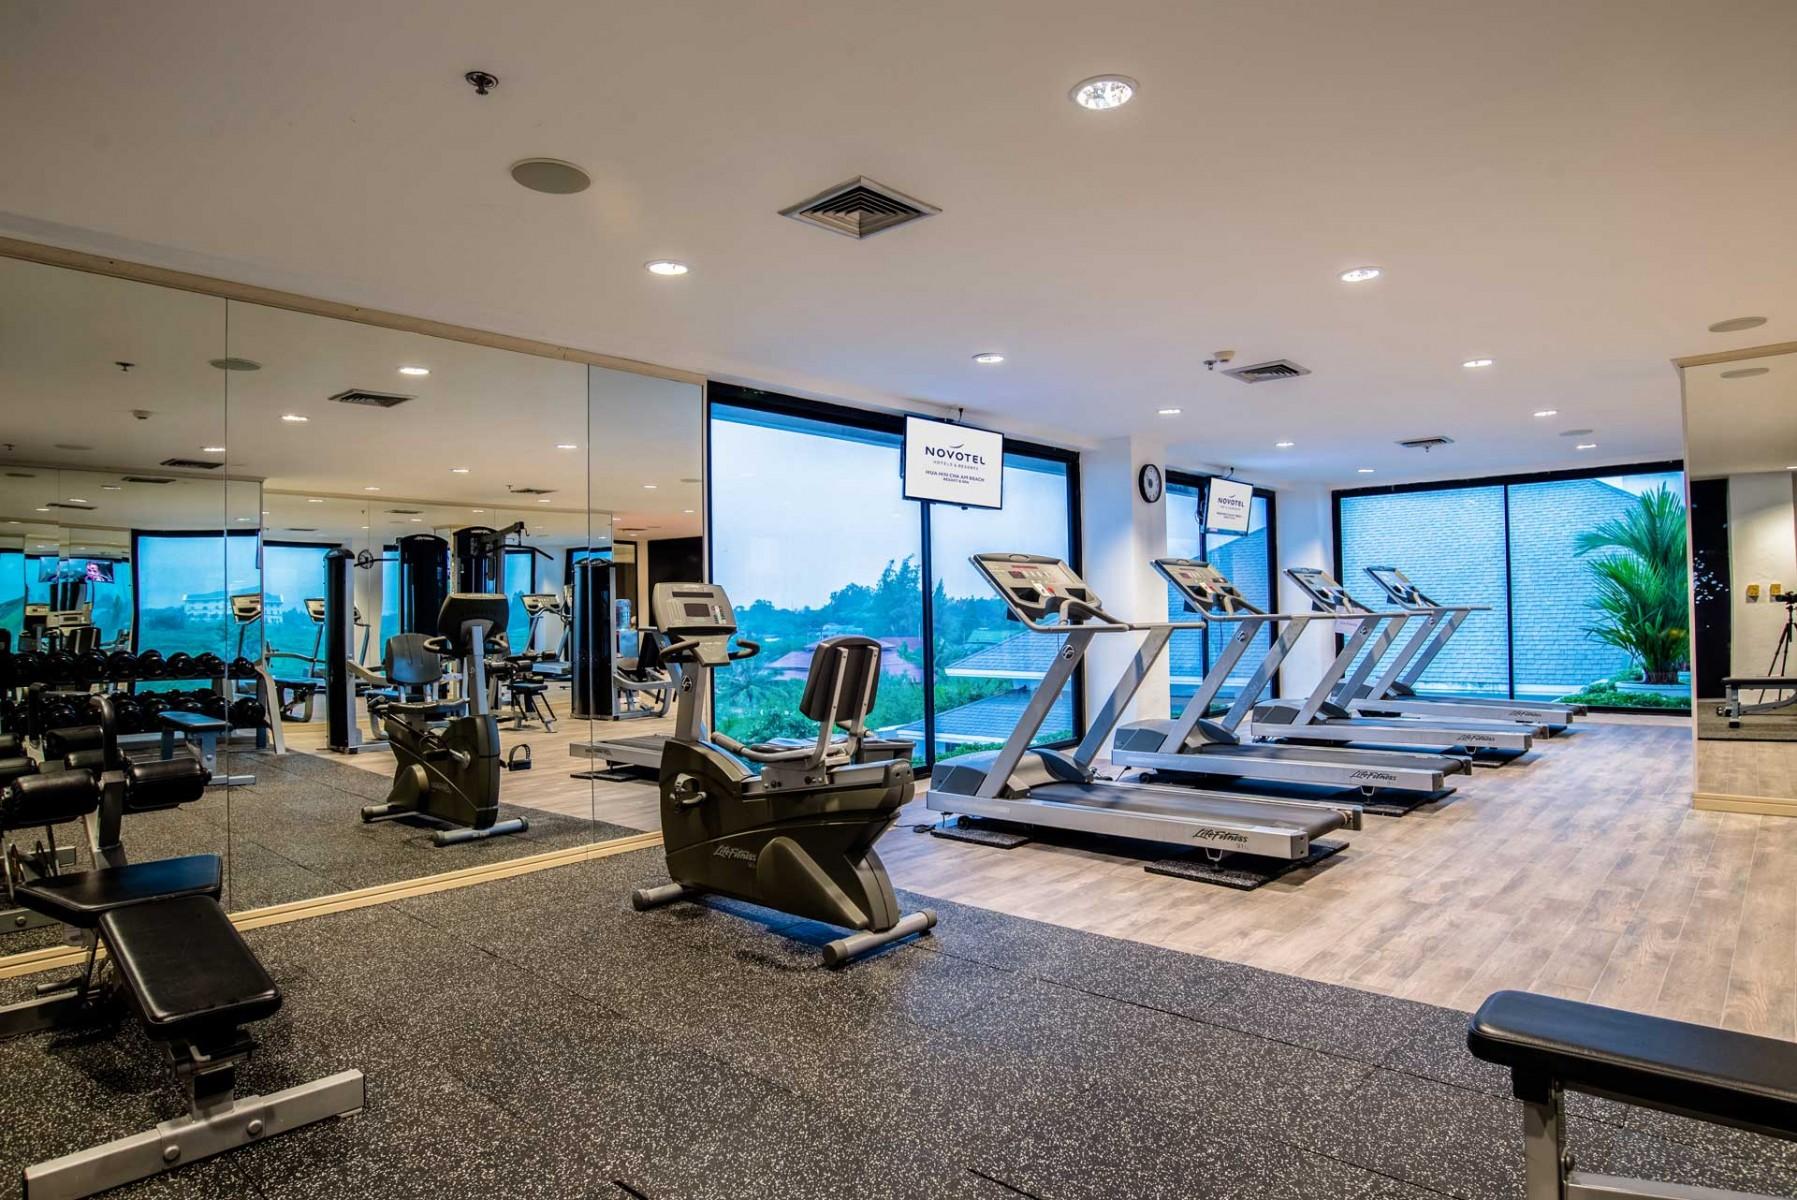 Novotel-Hua-Hin-fitness-Well-Being